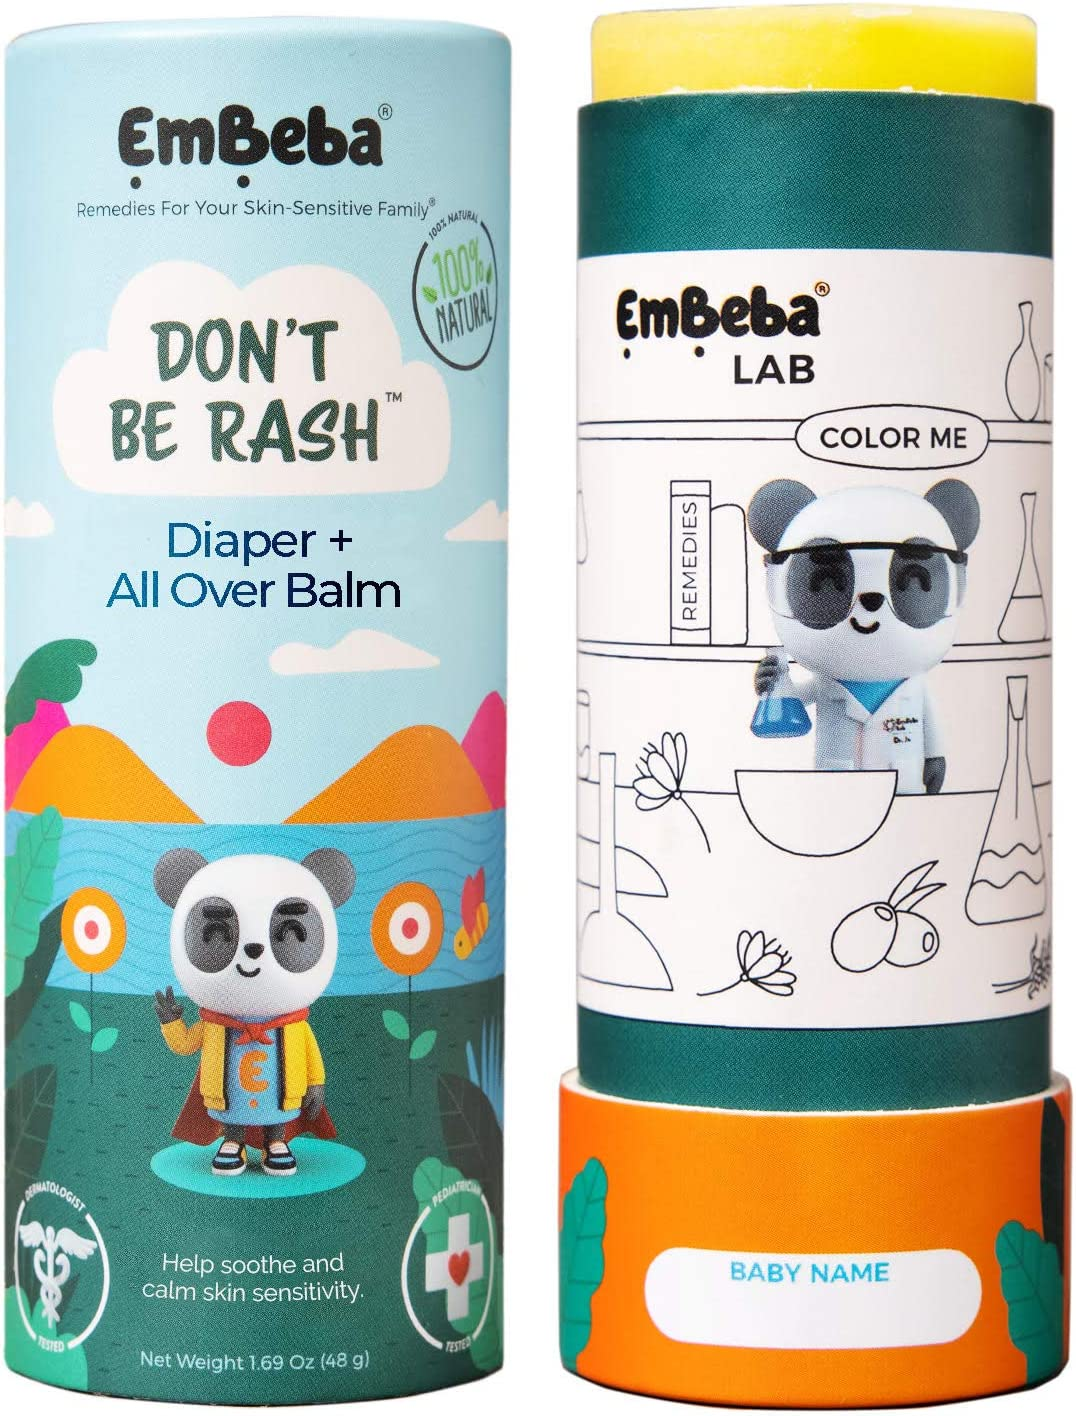 EmBeba Diaper Balm   Natural Rash Cream for Kids with Sensitive Skin   Travel Friendly with Built-in Diaper Rash Applicator   Pediatrician Tested Treatment for Newborn Bum